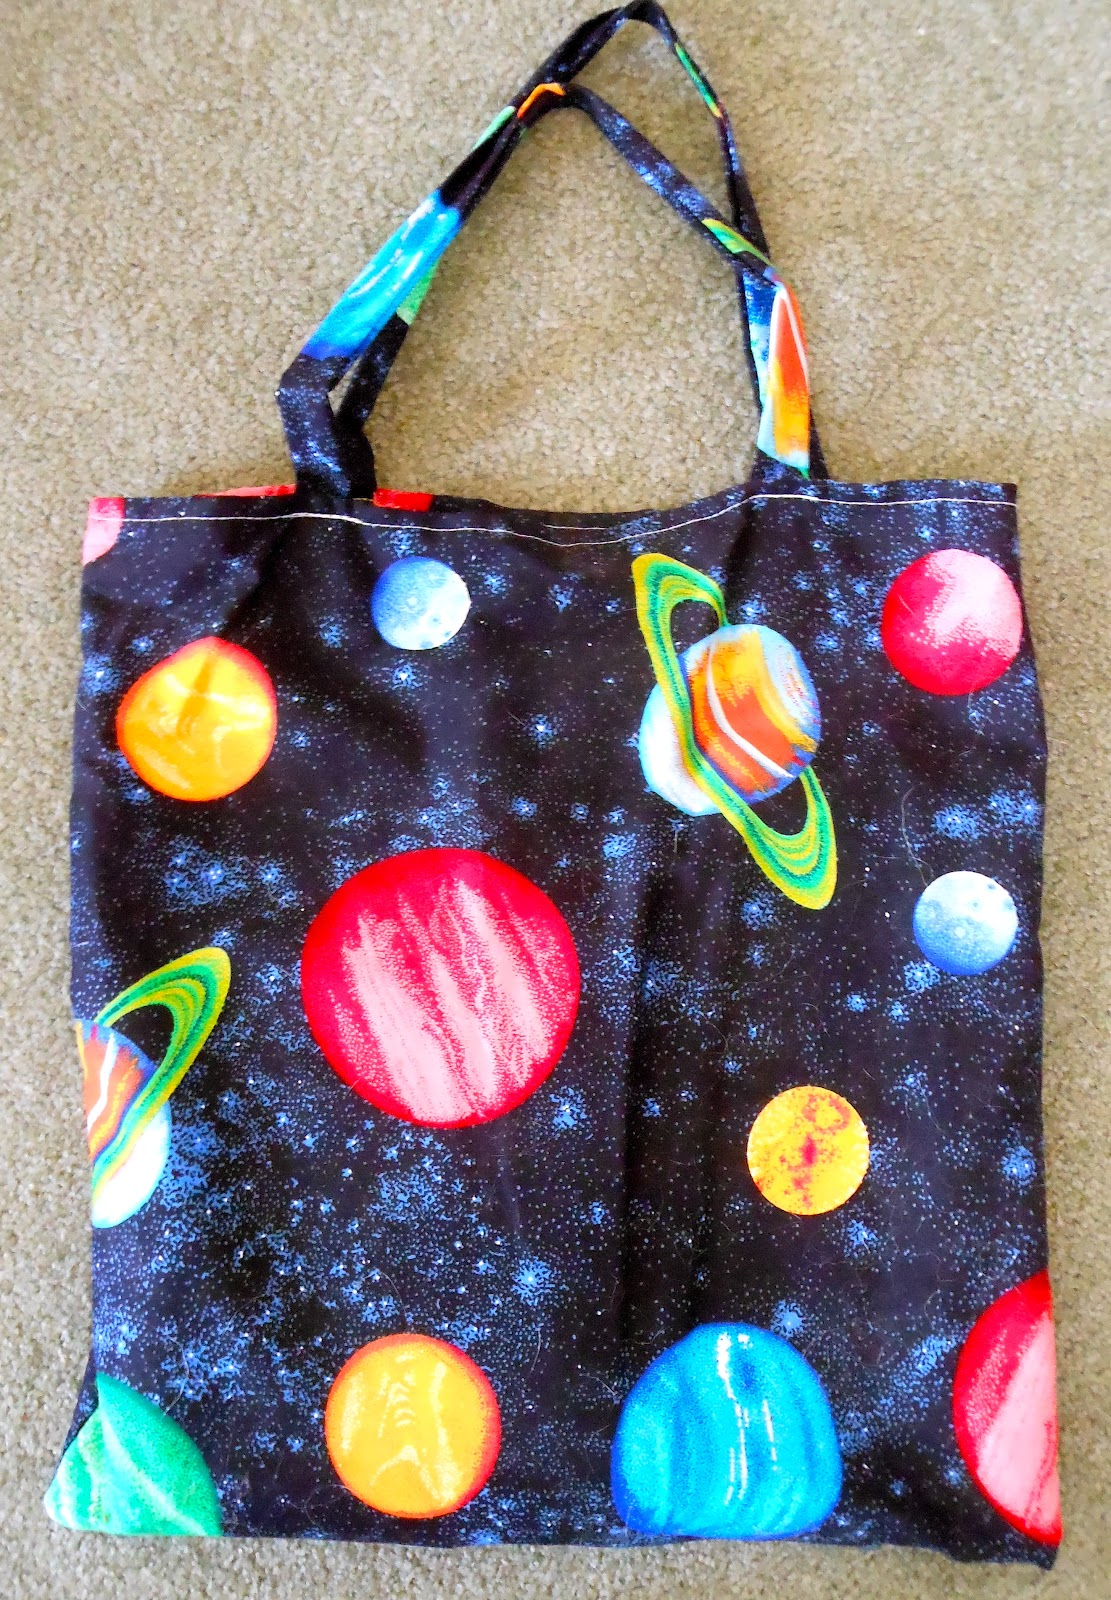 Kinderdi space bag space bag publicscrutiny Gallery